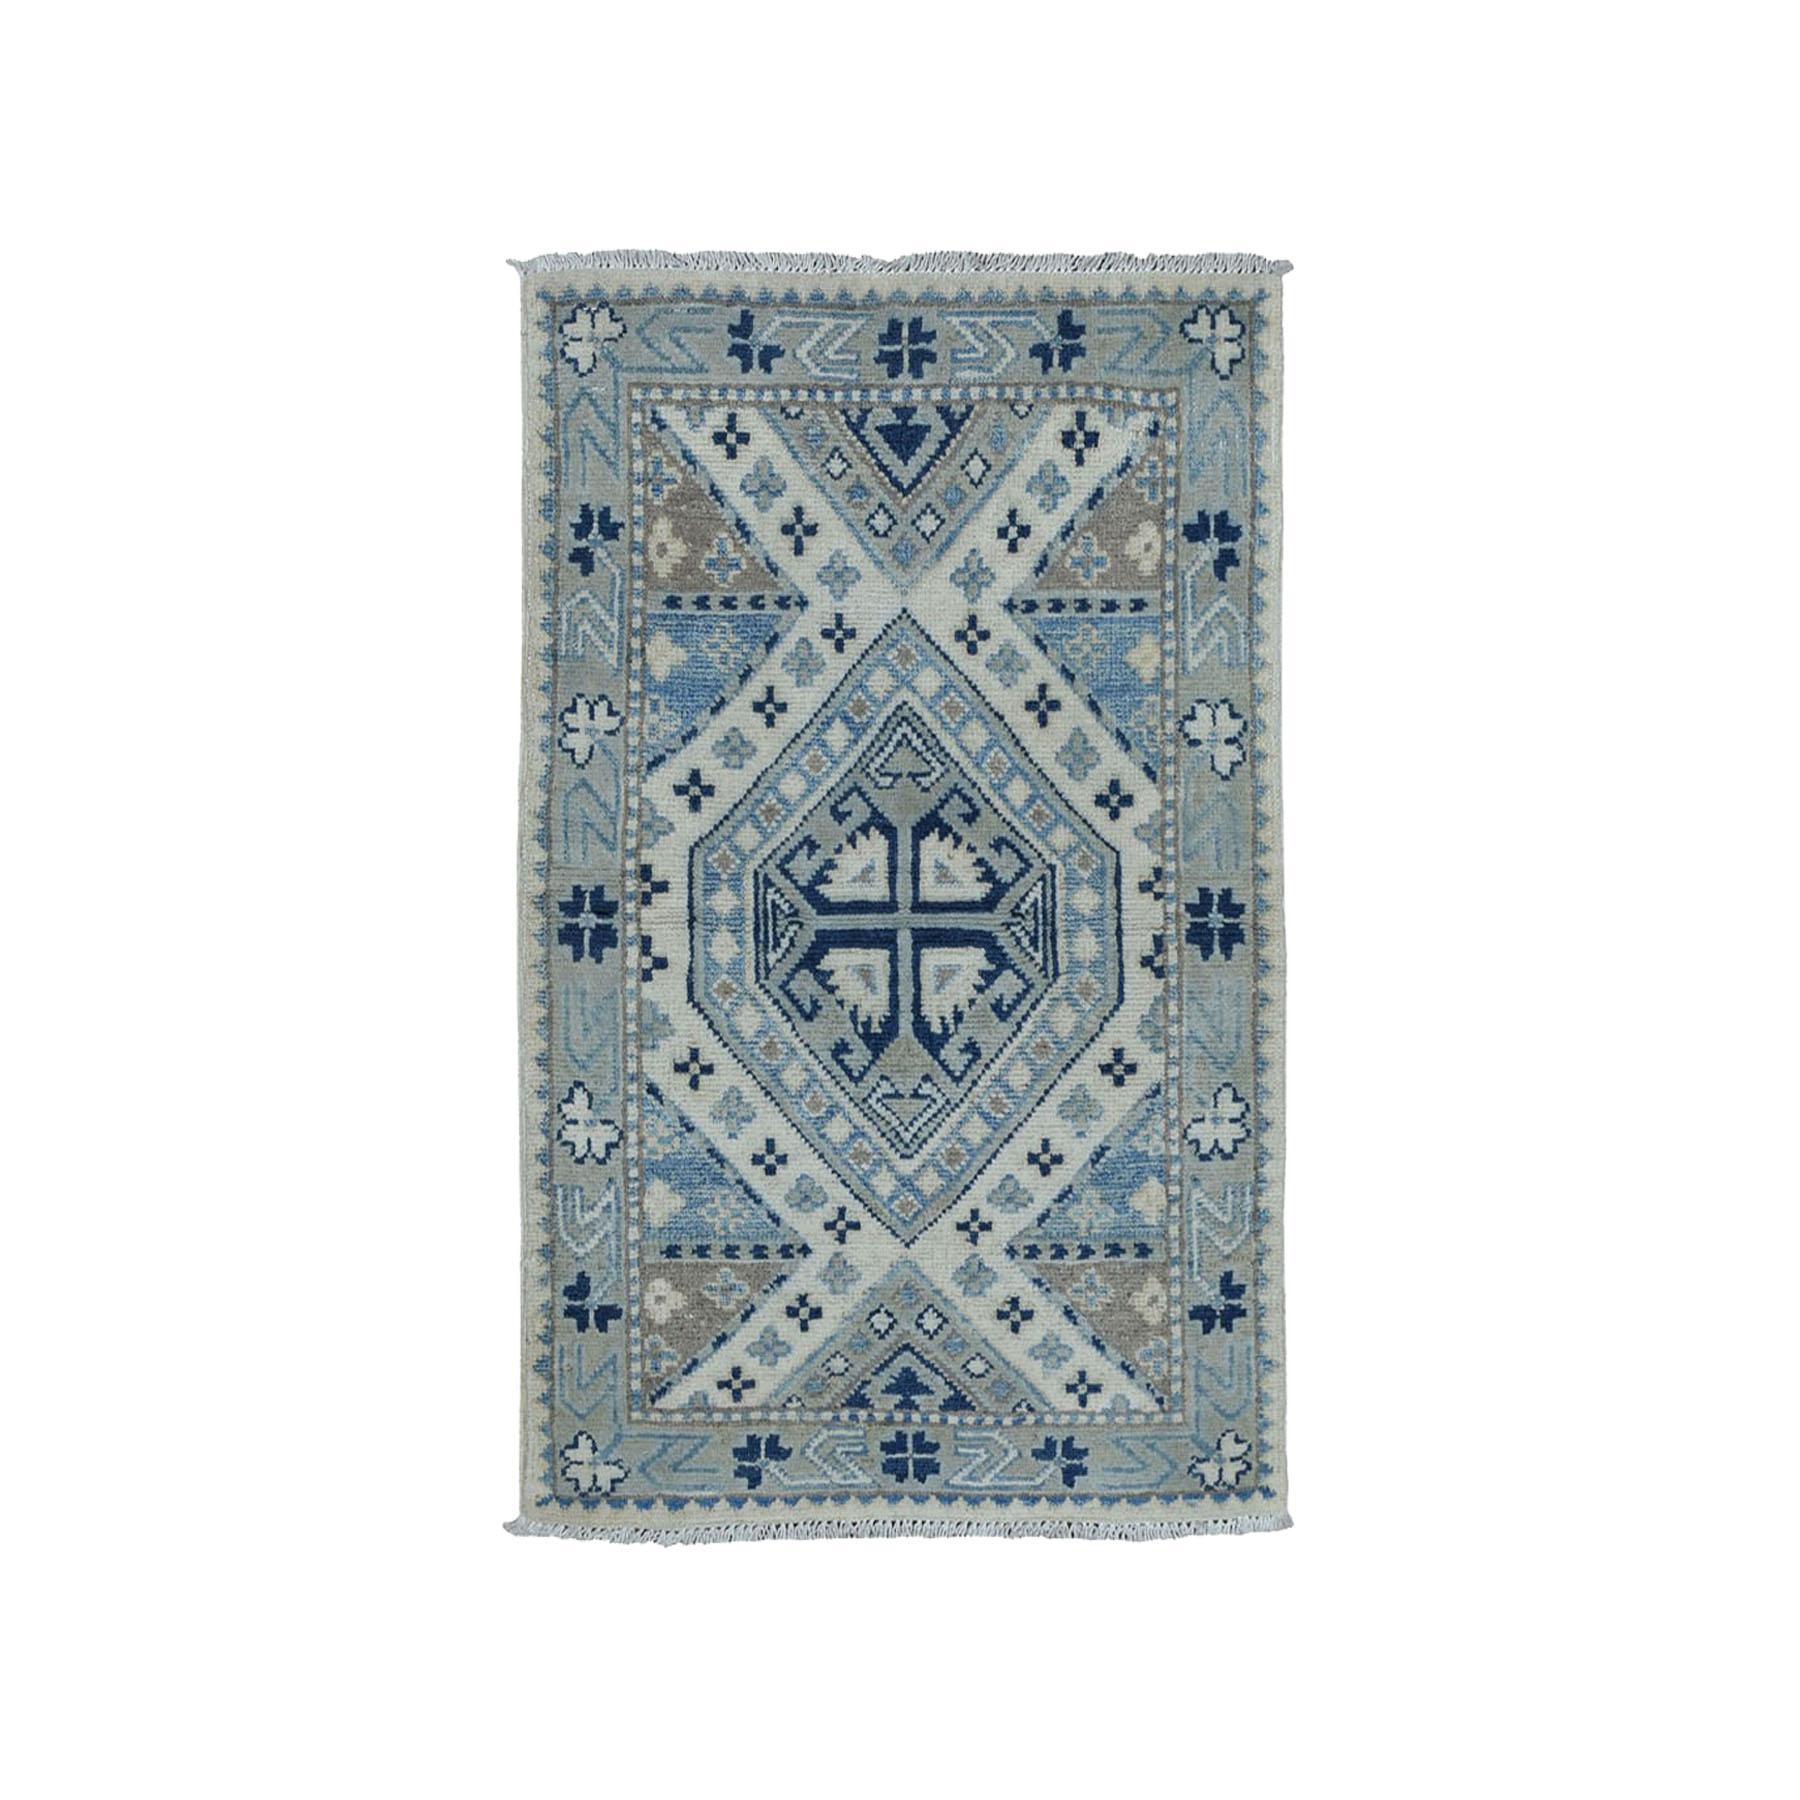 "2'X2'10"" Hand-Knotted Pure Wool Vintage Look Kazak Oriental Rug moae00ce"